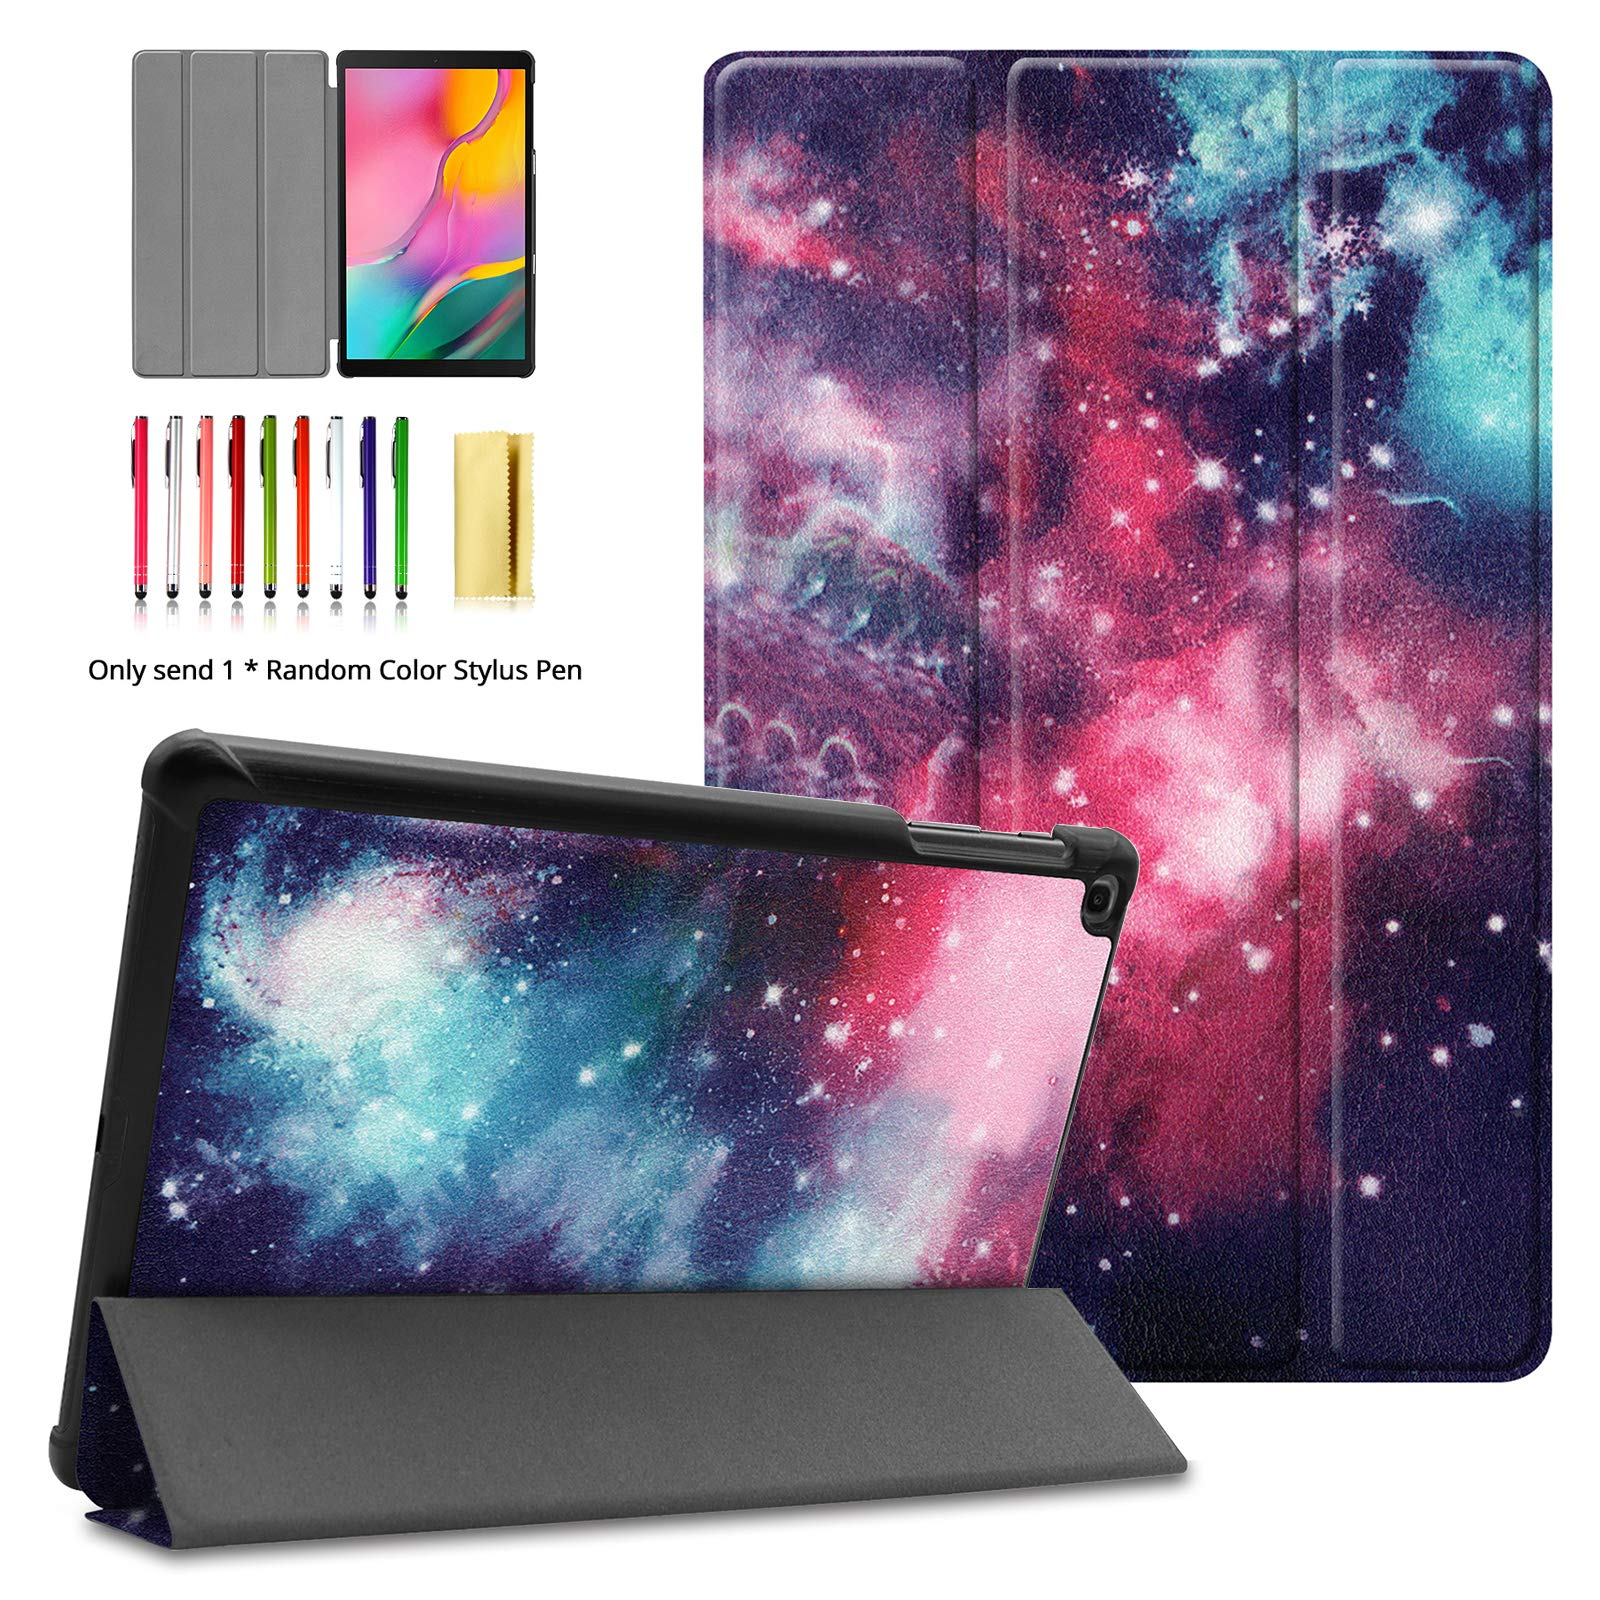 Funda Samsung Galaxy Tab A 10.1 SM-T510 (2019) LITTLEMAX [7RHJ44SX]